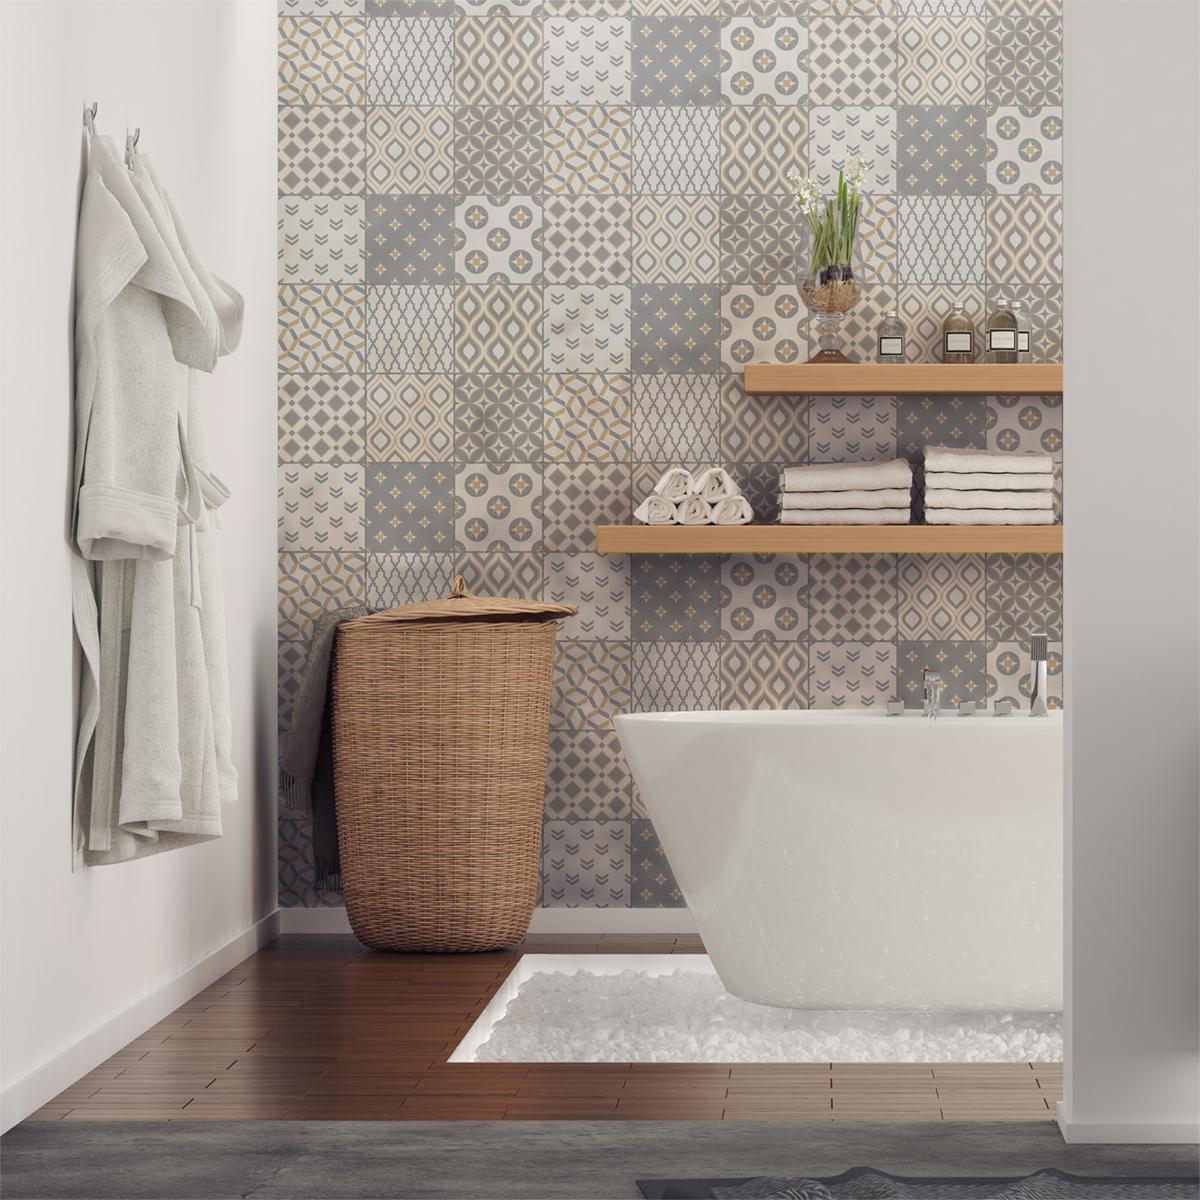 9 stickers carreaux de ciment scandinave samtida salle. Black Bedroom Furniture Sets. Home Design Ideas